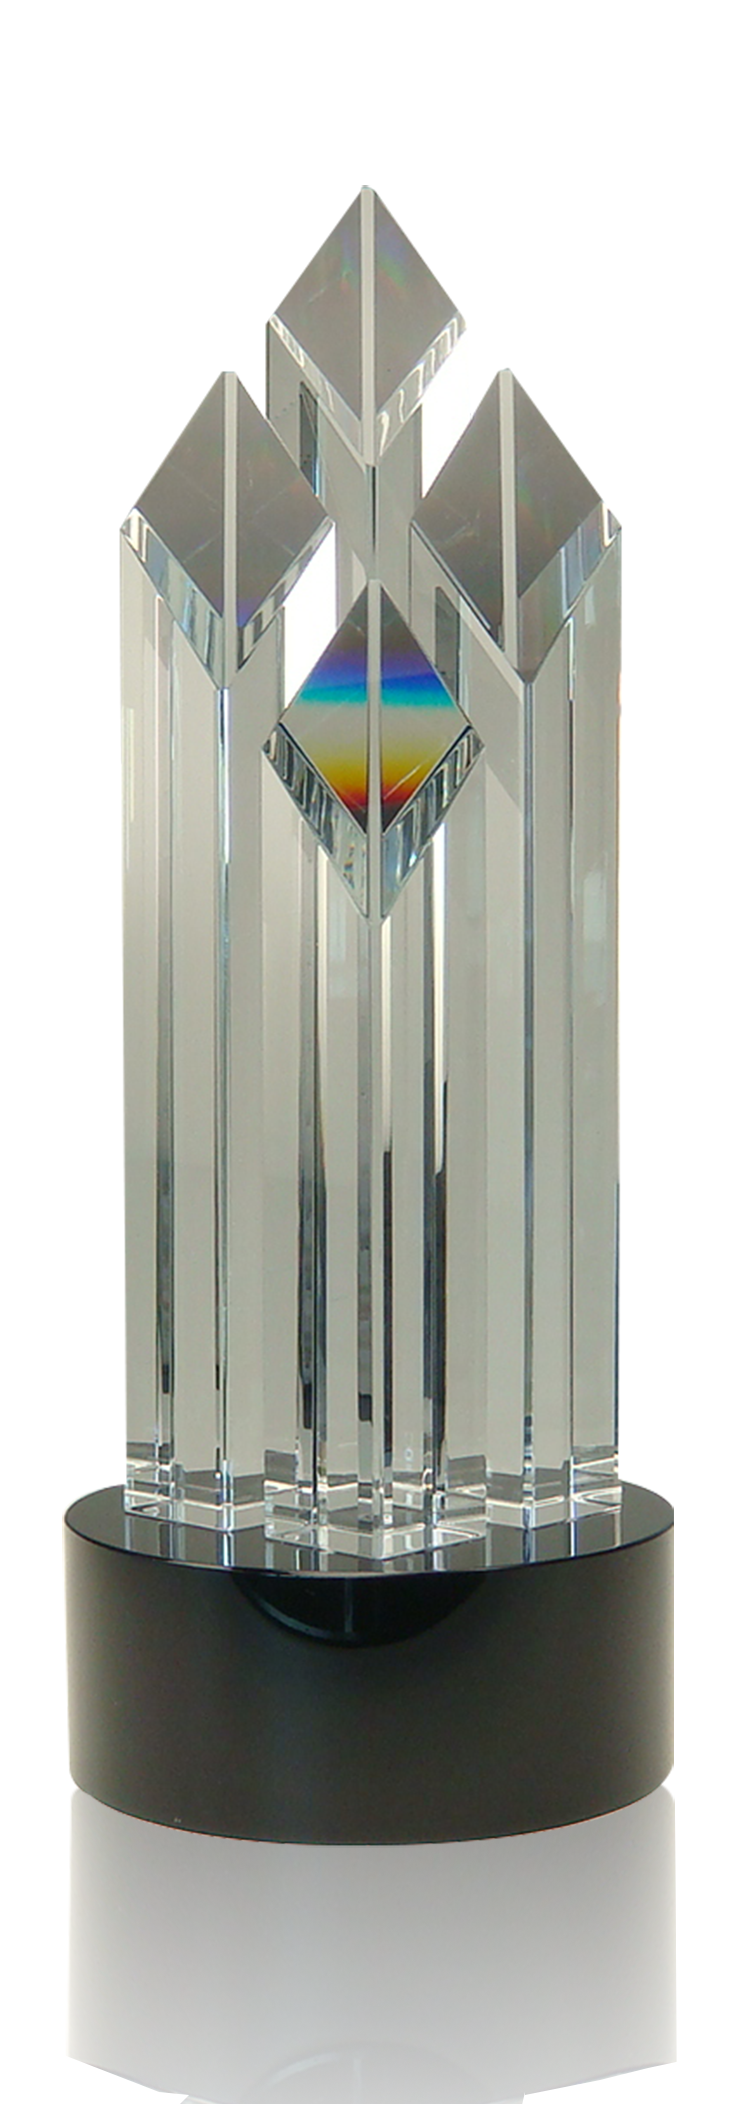 Diamond Crystal Tower, Black Base